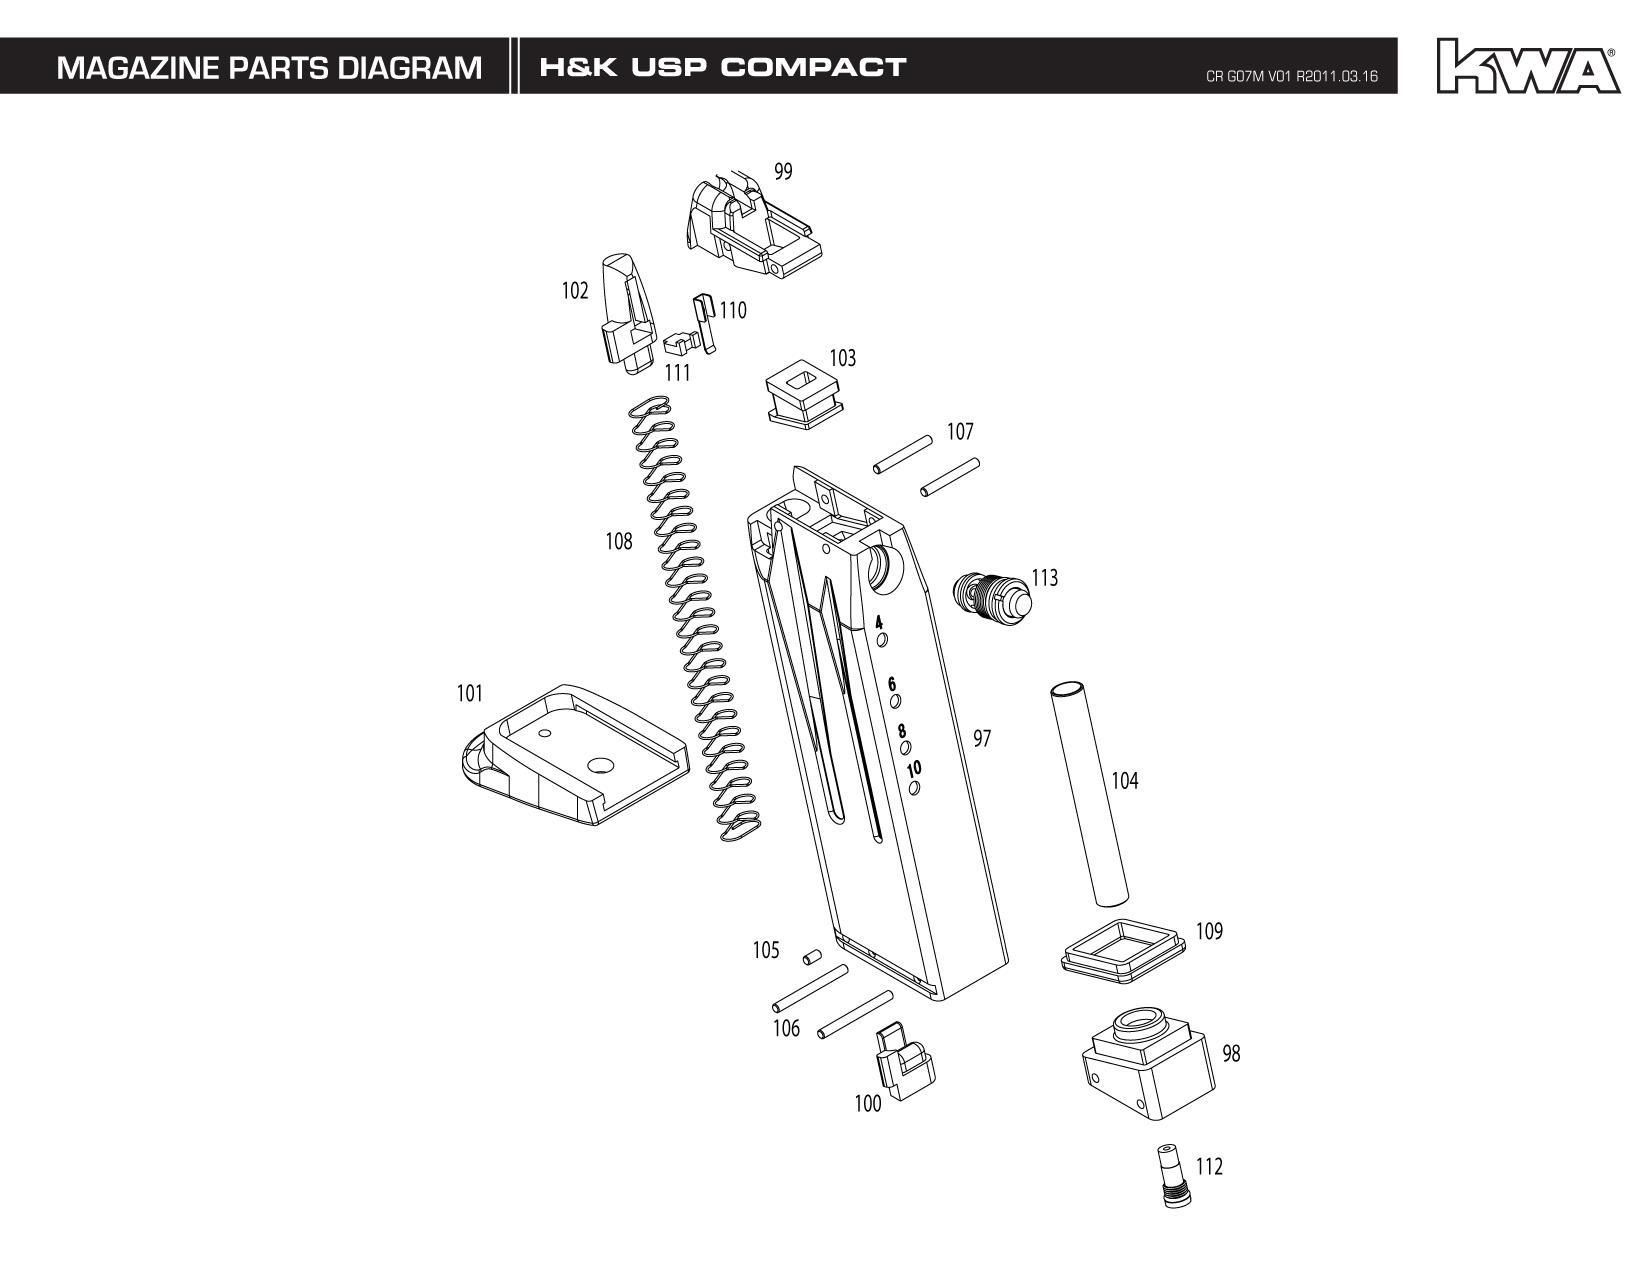 Kj Works Parts Diagram